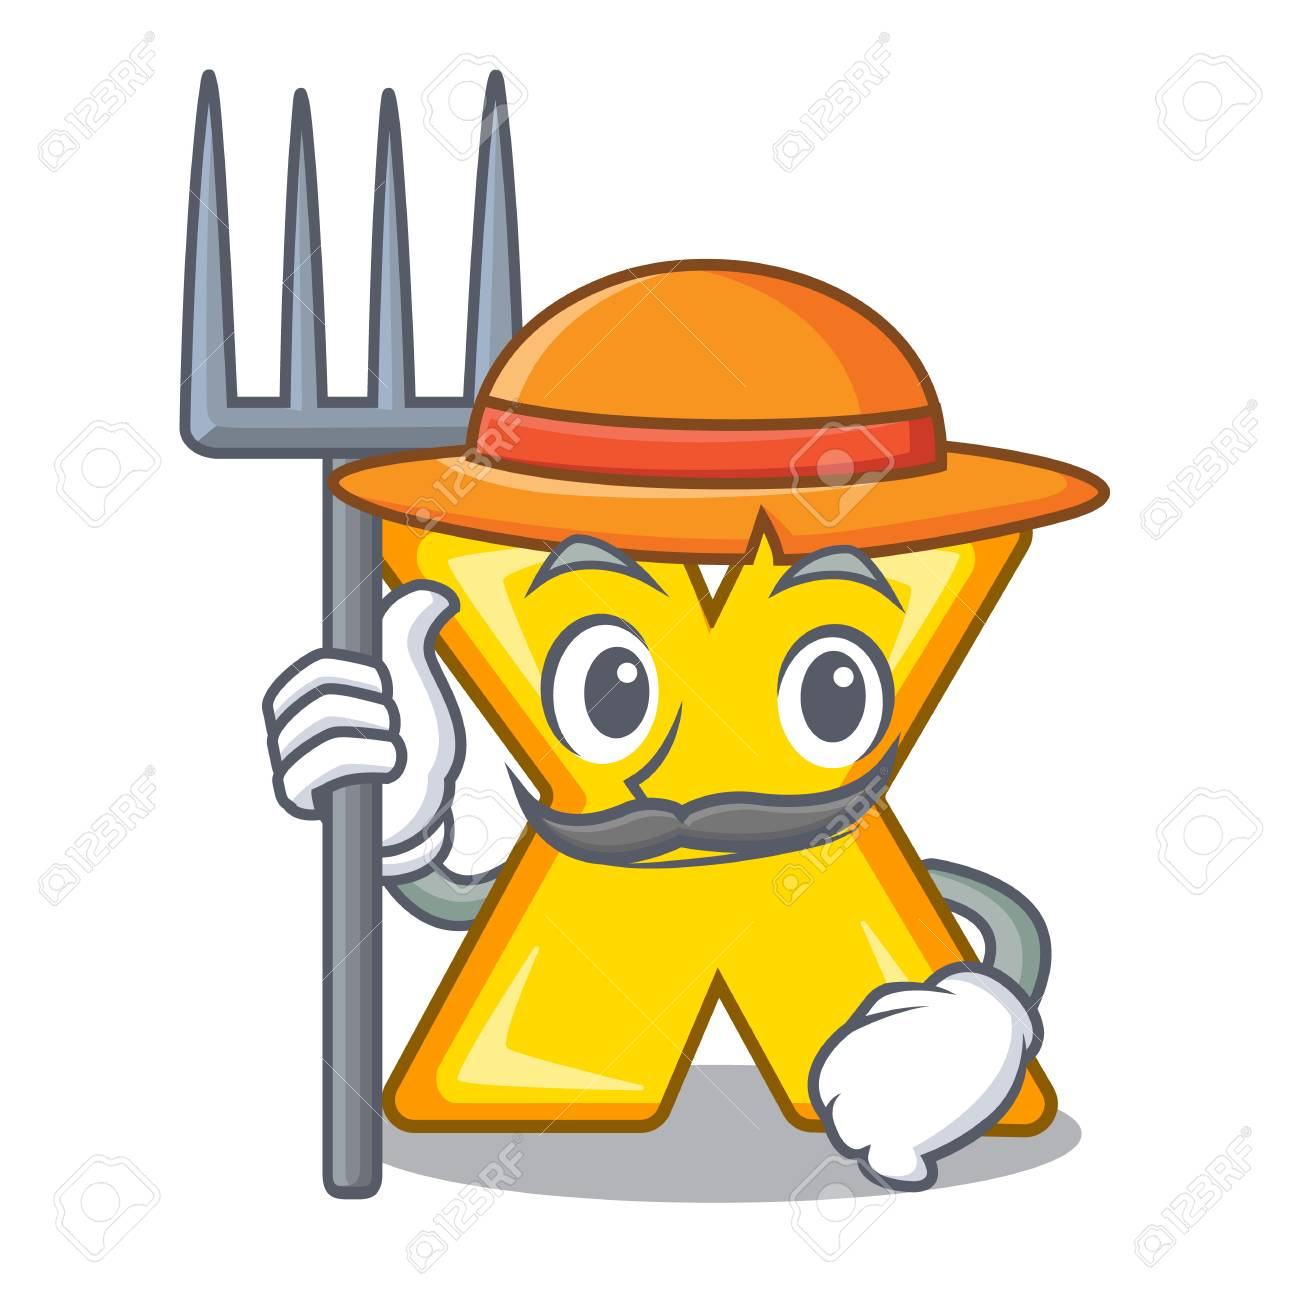 Farmer character cartoon multiply sign - 110456996